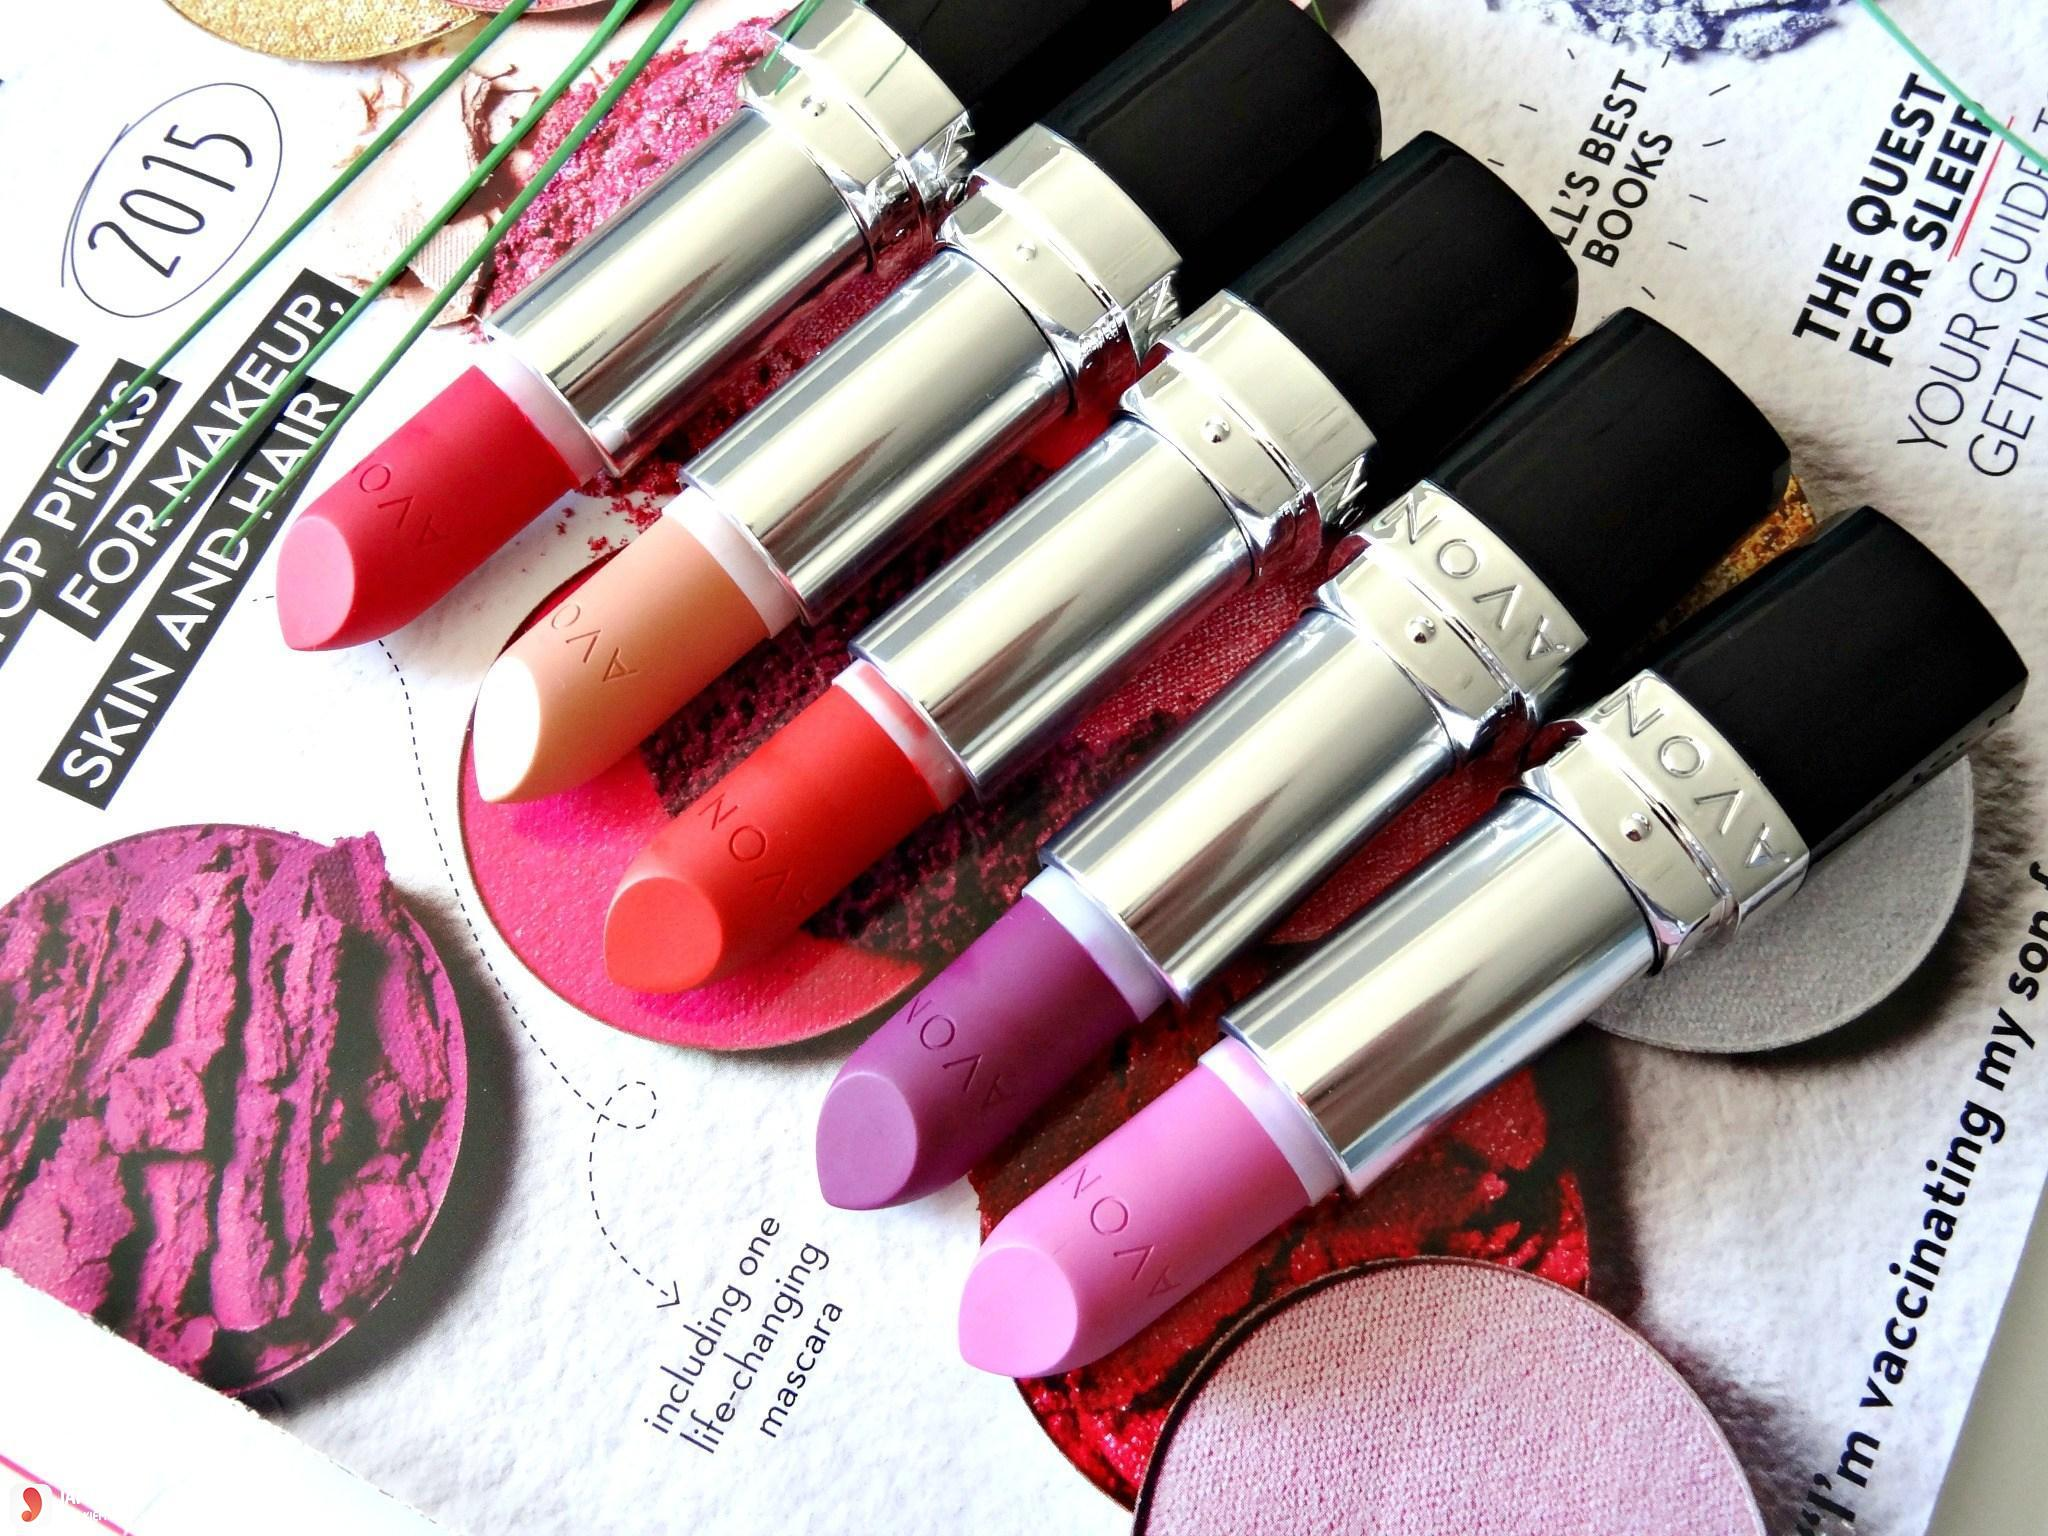 Thiết kế của son Avon Perfectly Matte Lipstick Line